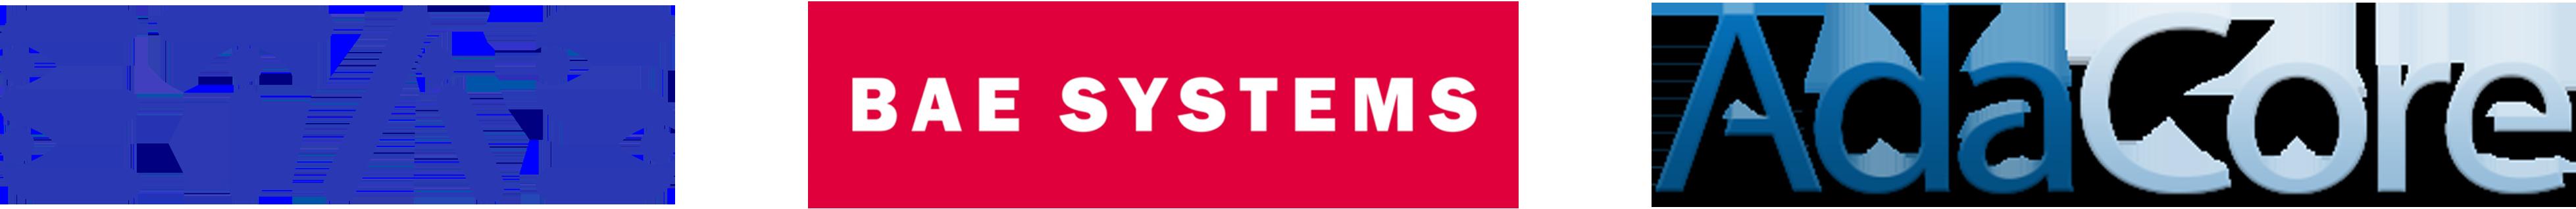 third party logos